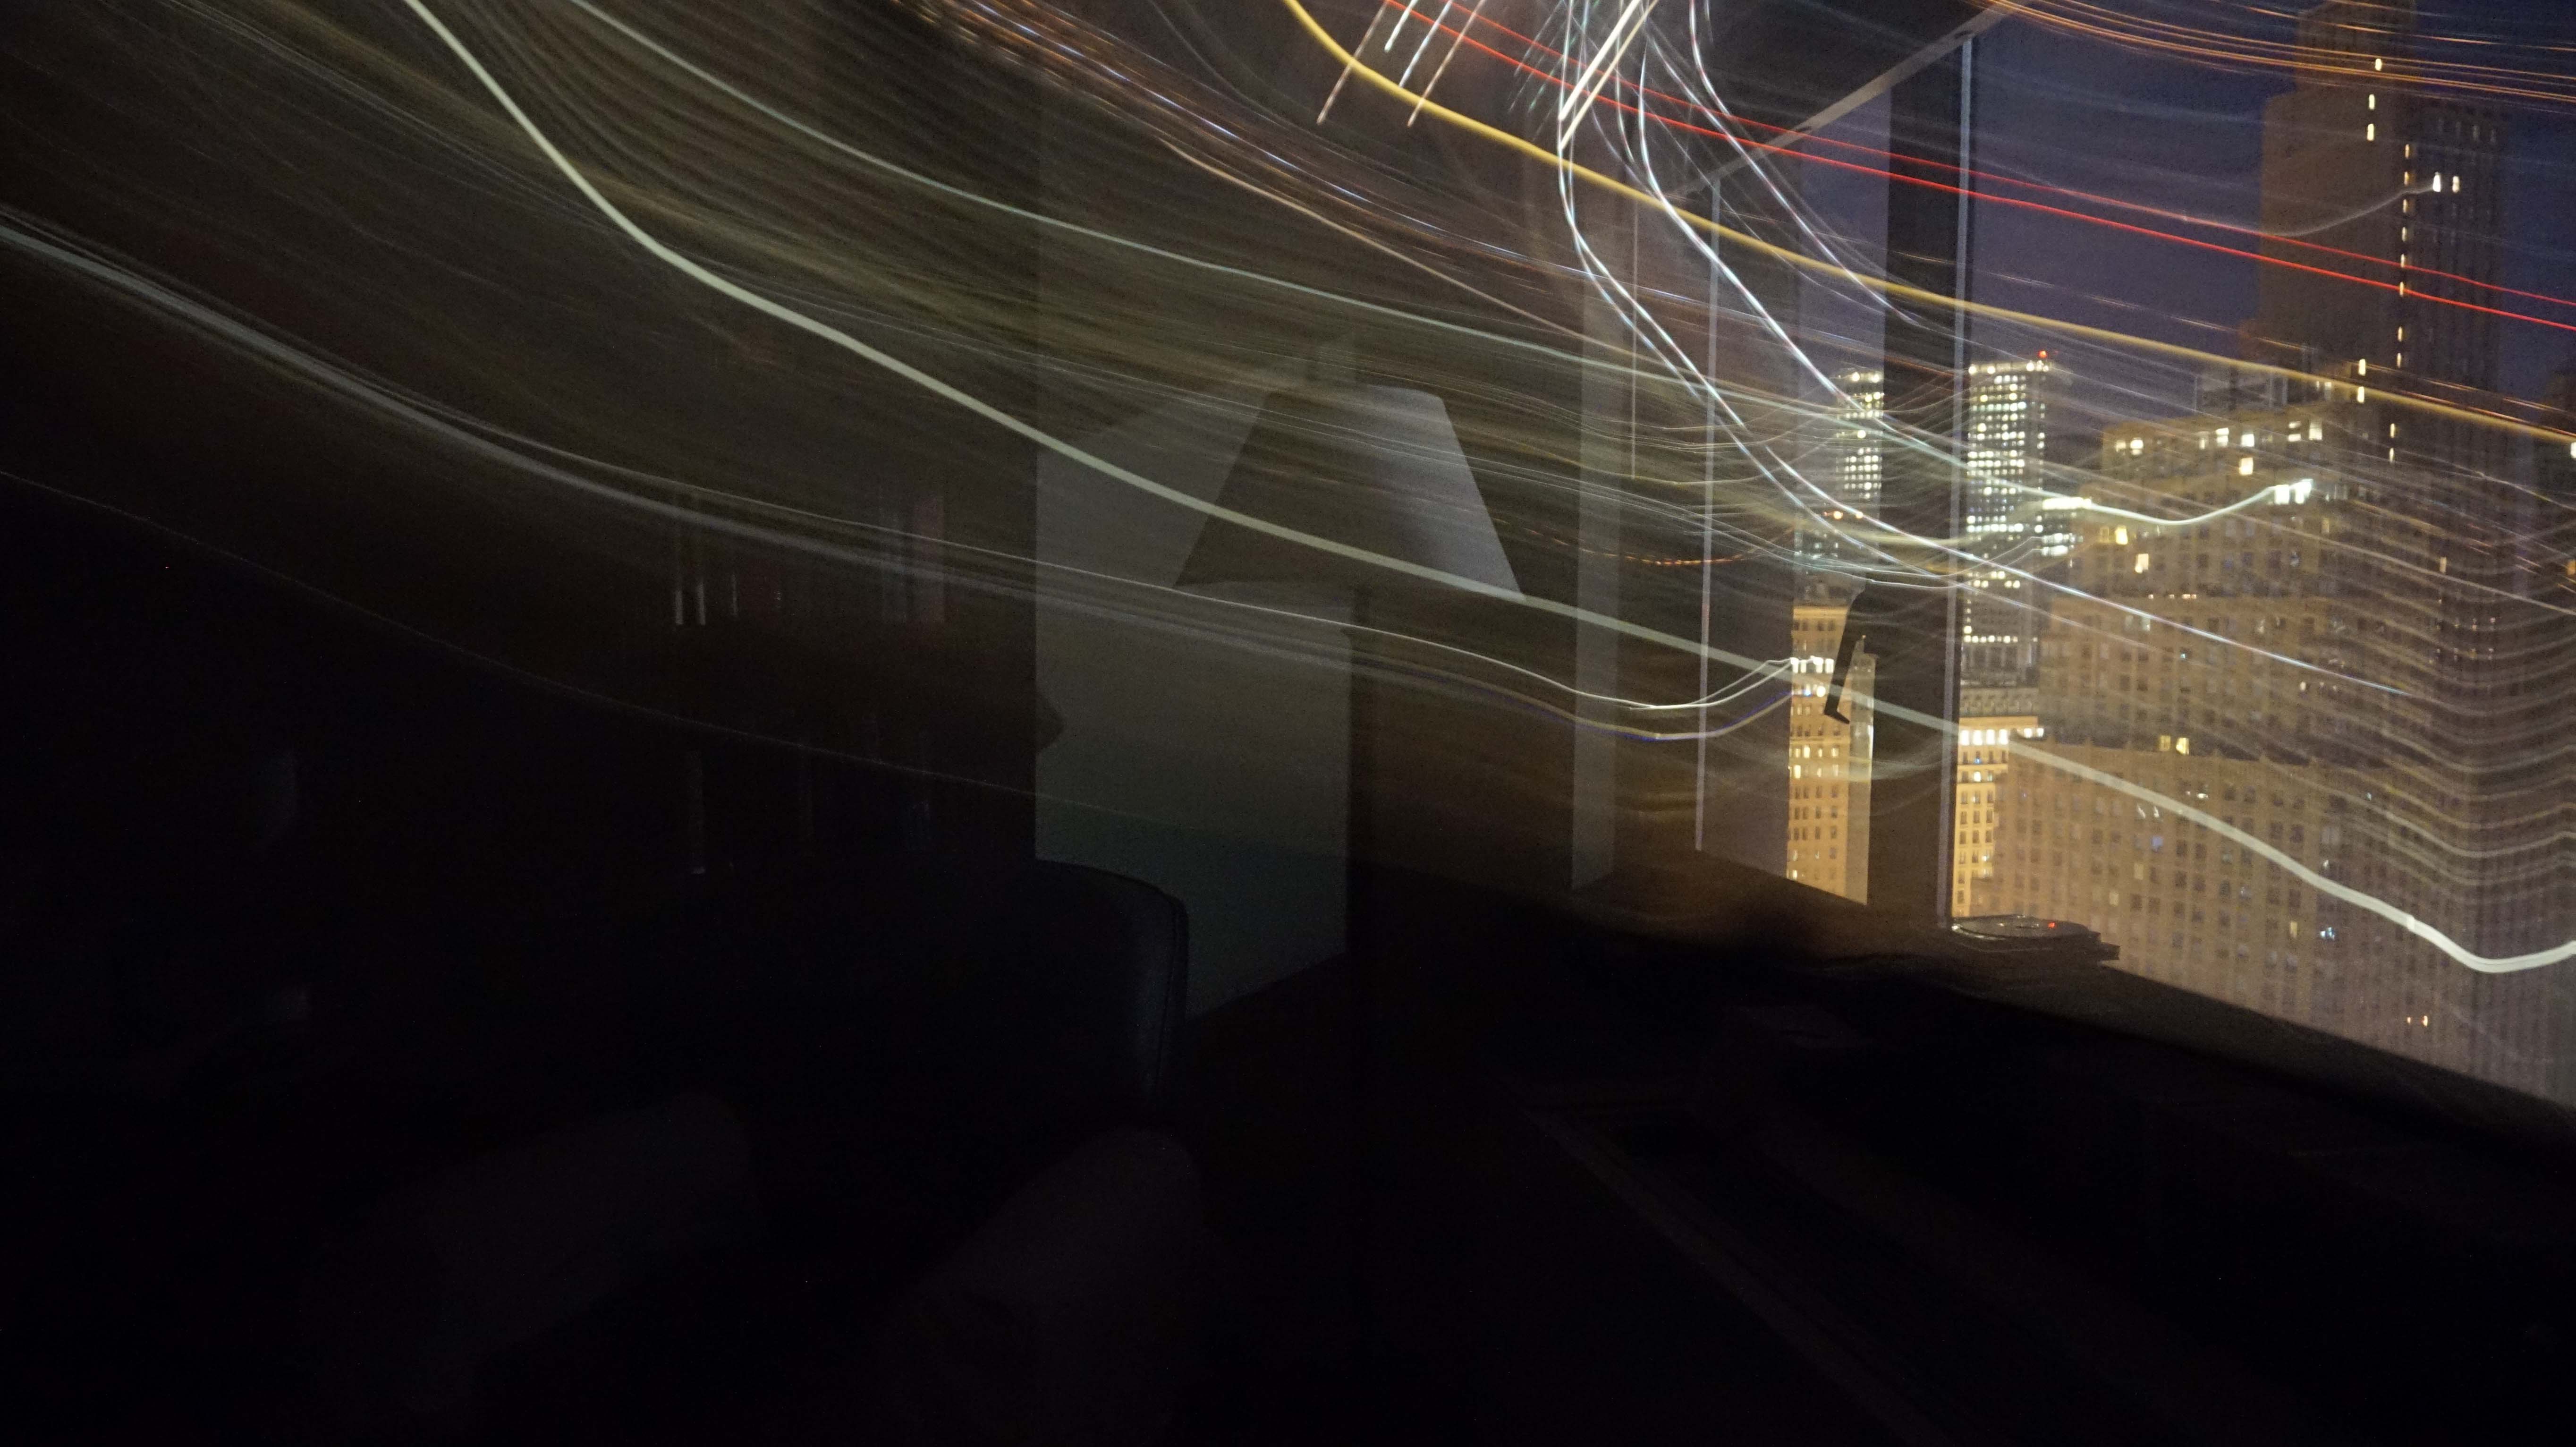 Room blur low